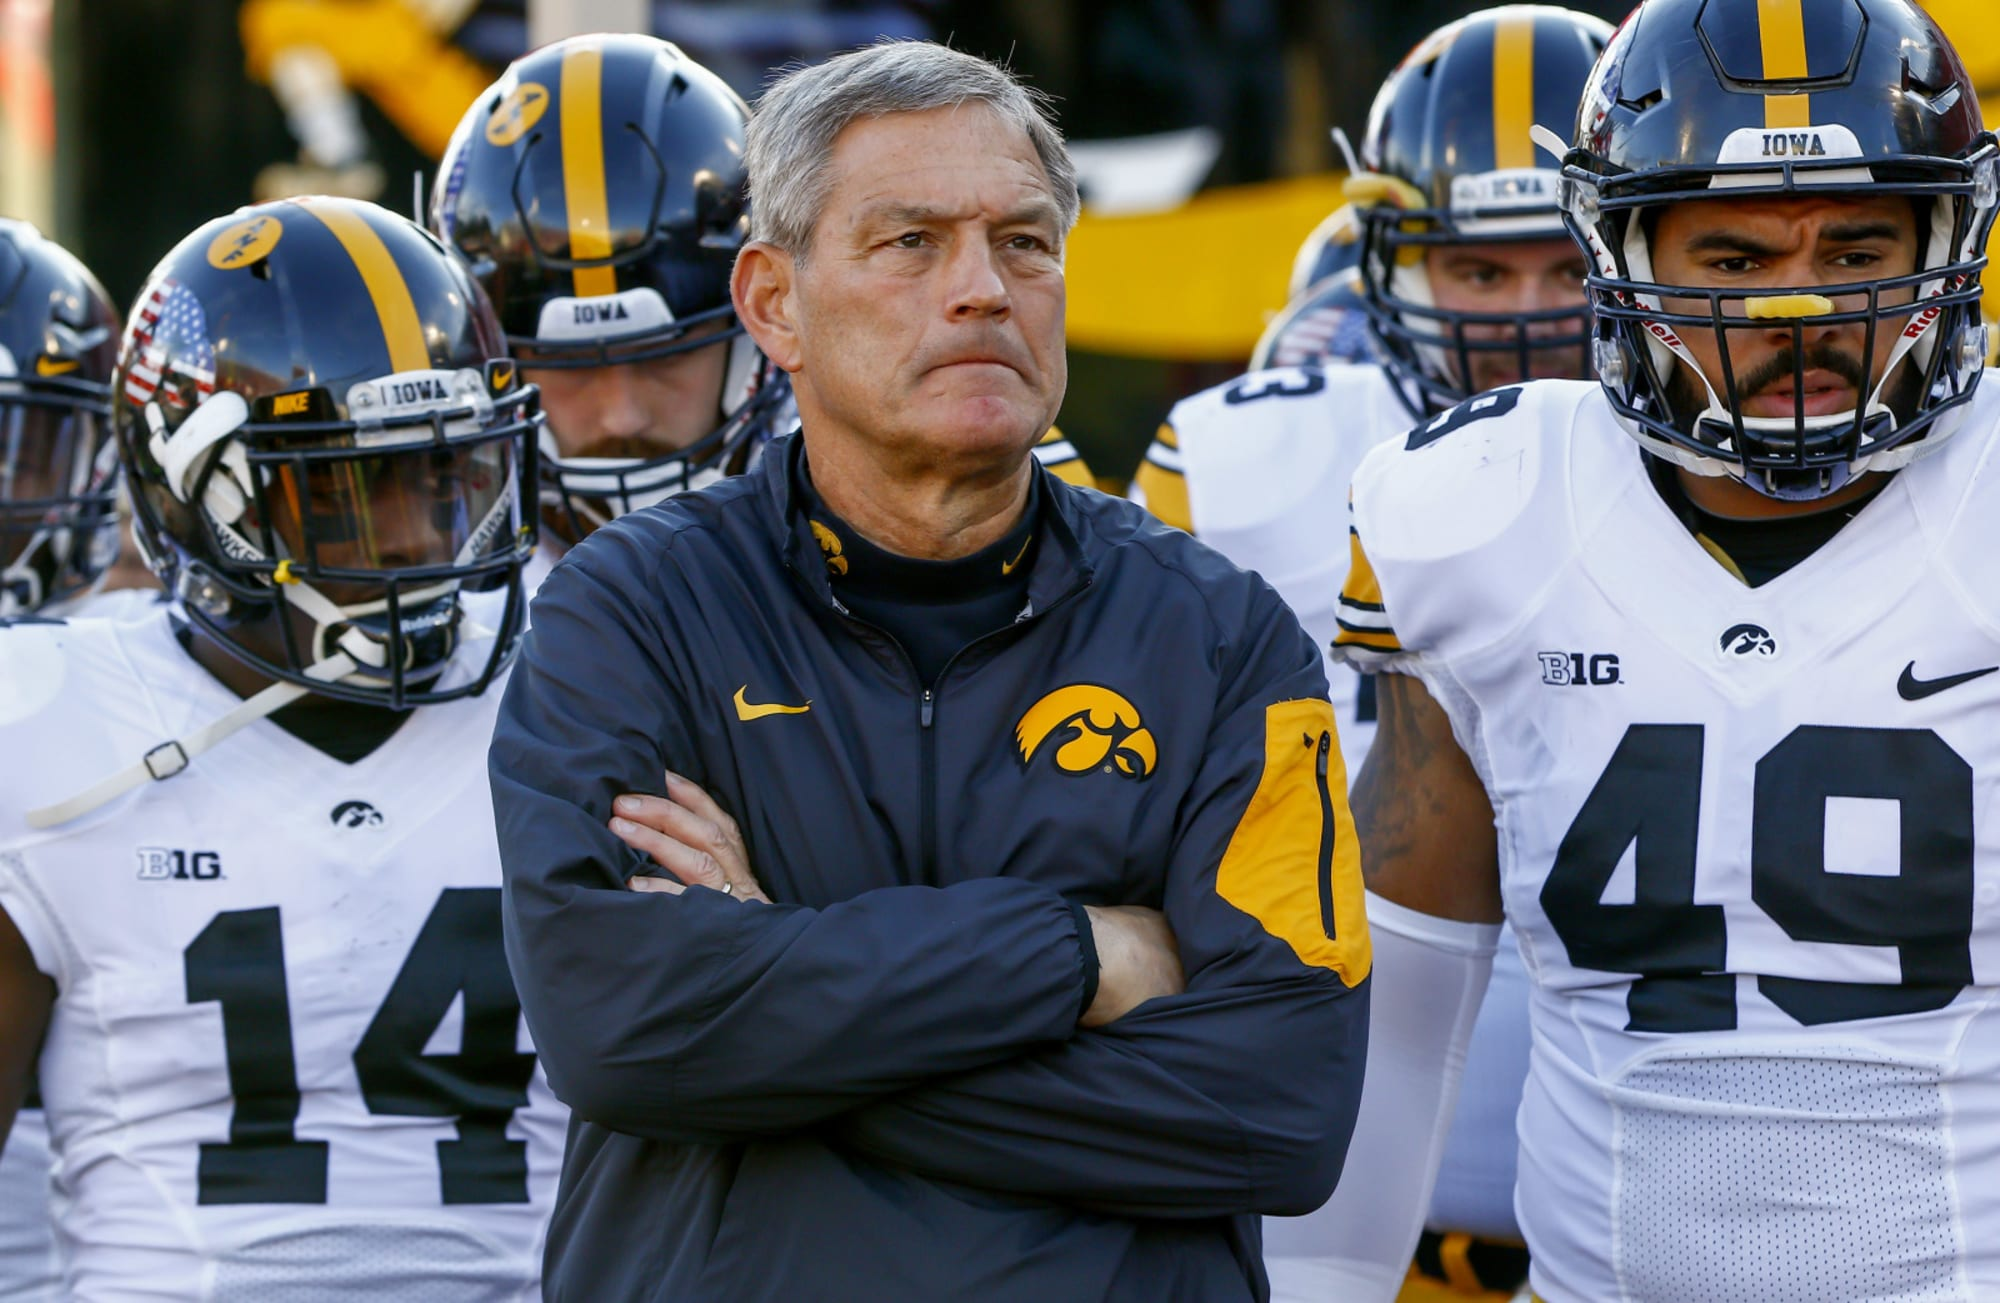 Iowa football: Kirk Ferentz disrespected in coach rankings